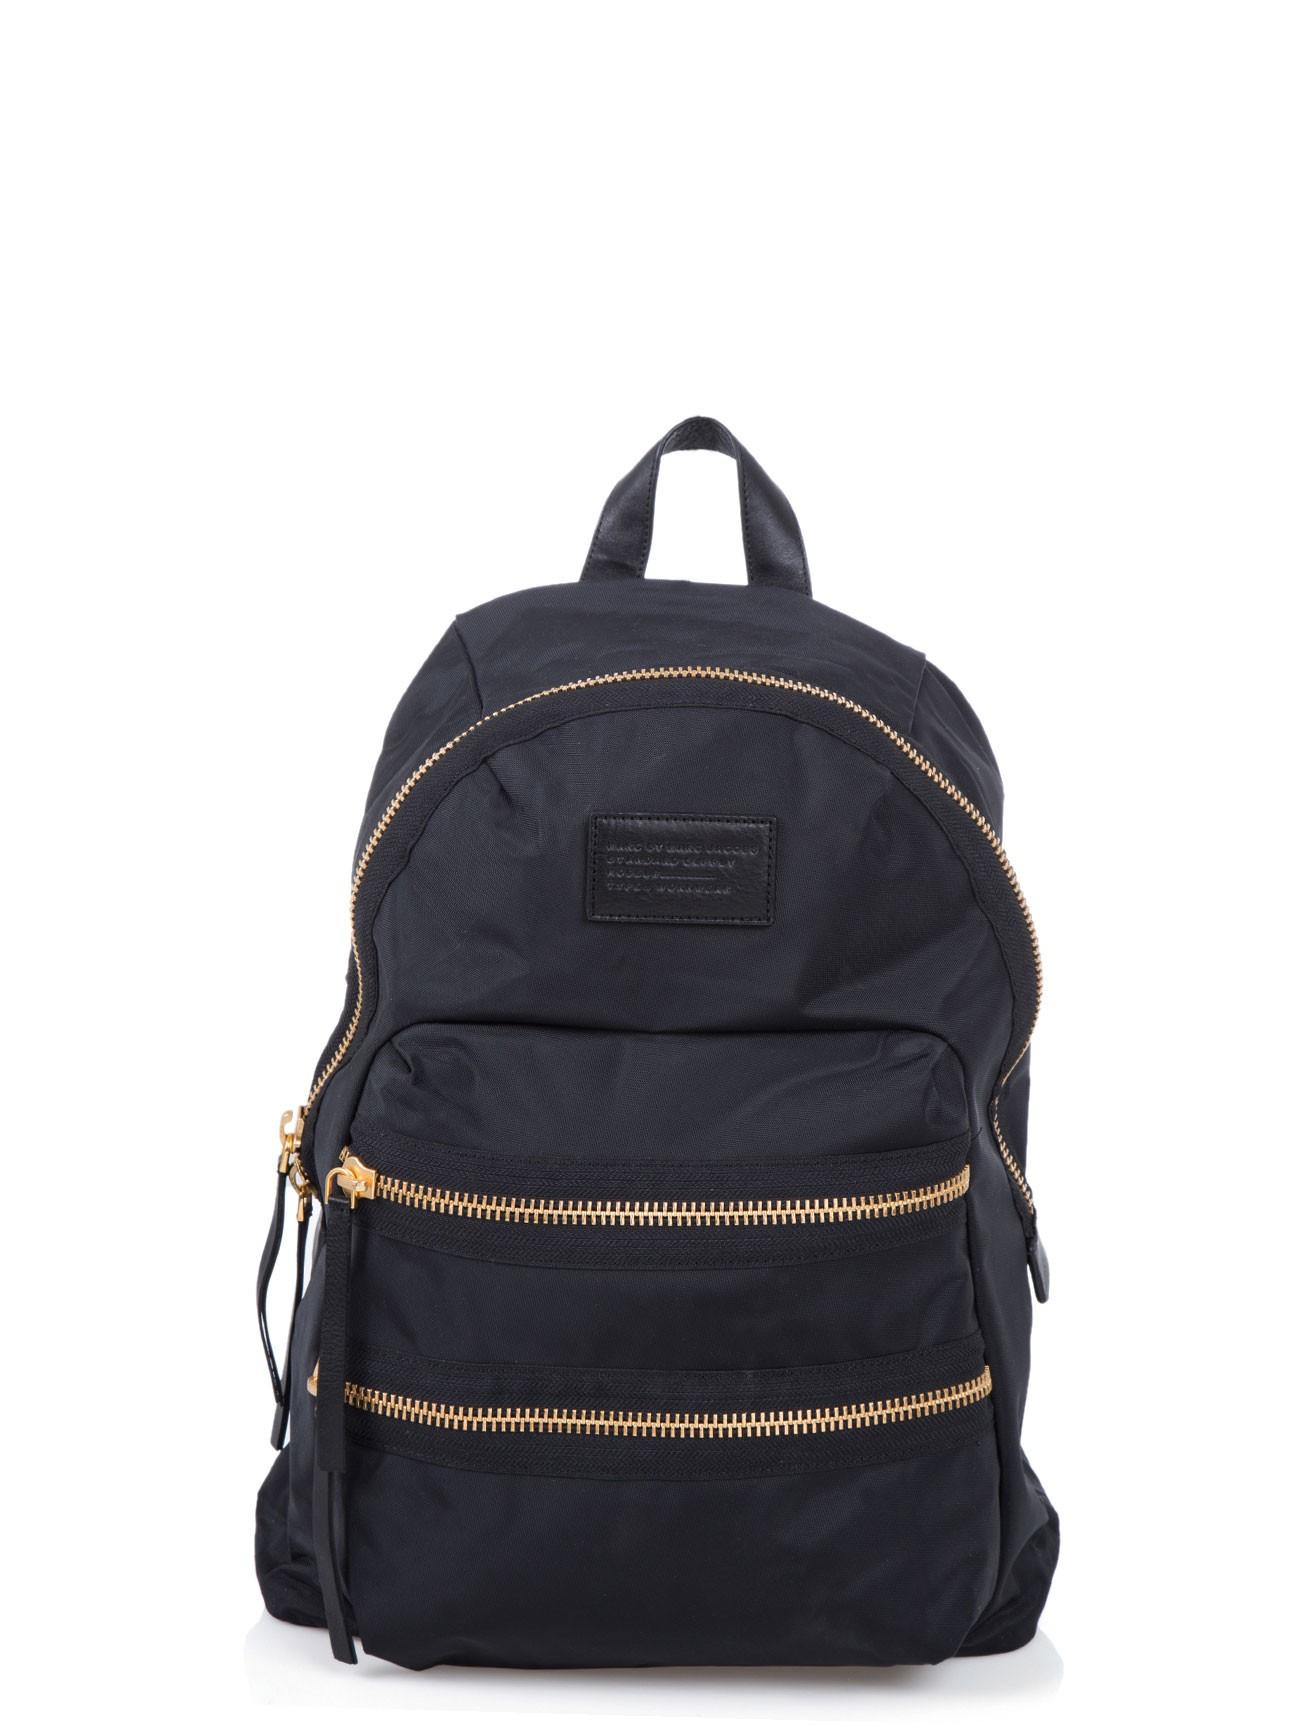 marc by marc jacobs nylon backpack in black for men lyst. Black Bedroom Furniture Sets. Home Design Ideas